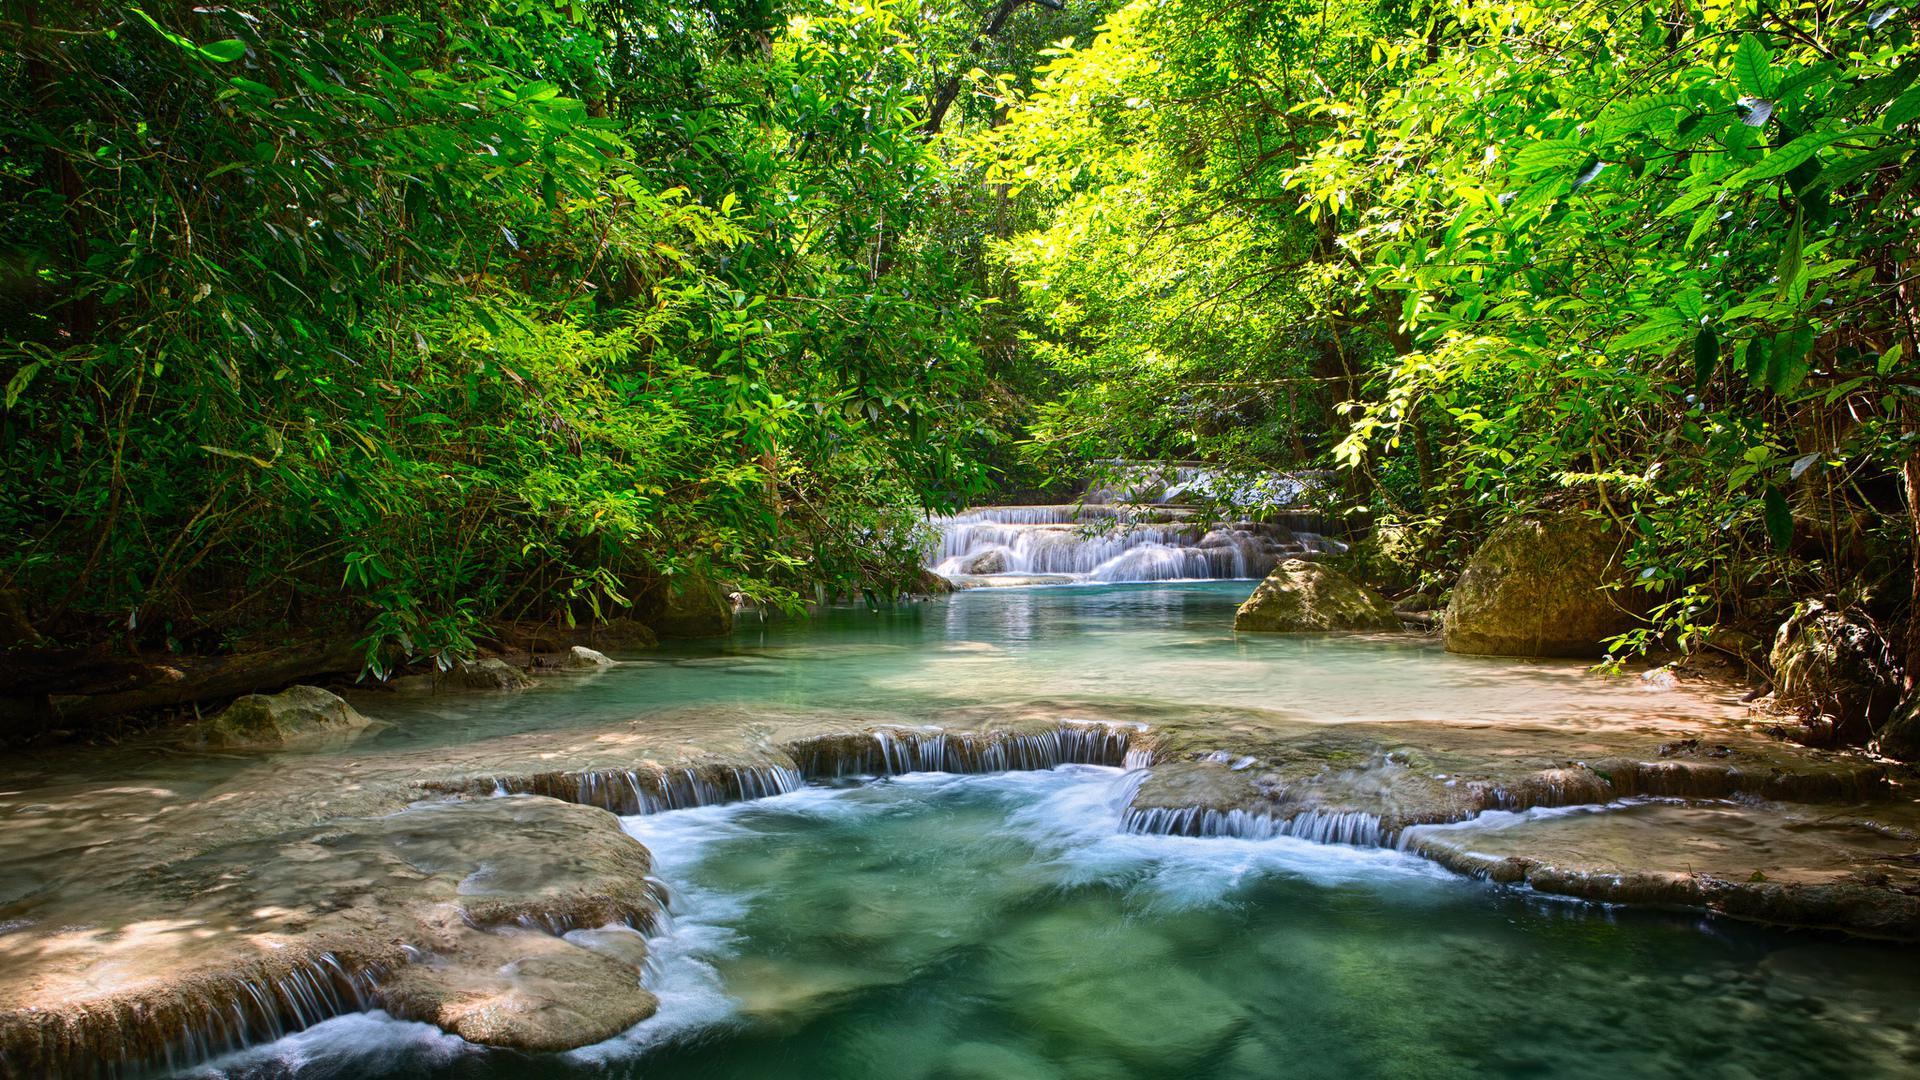 Beautiful falls in a forest stream HQ WALLPAPER - (#98041)